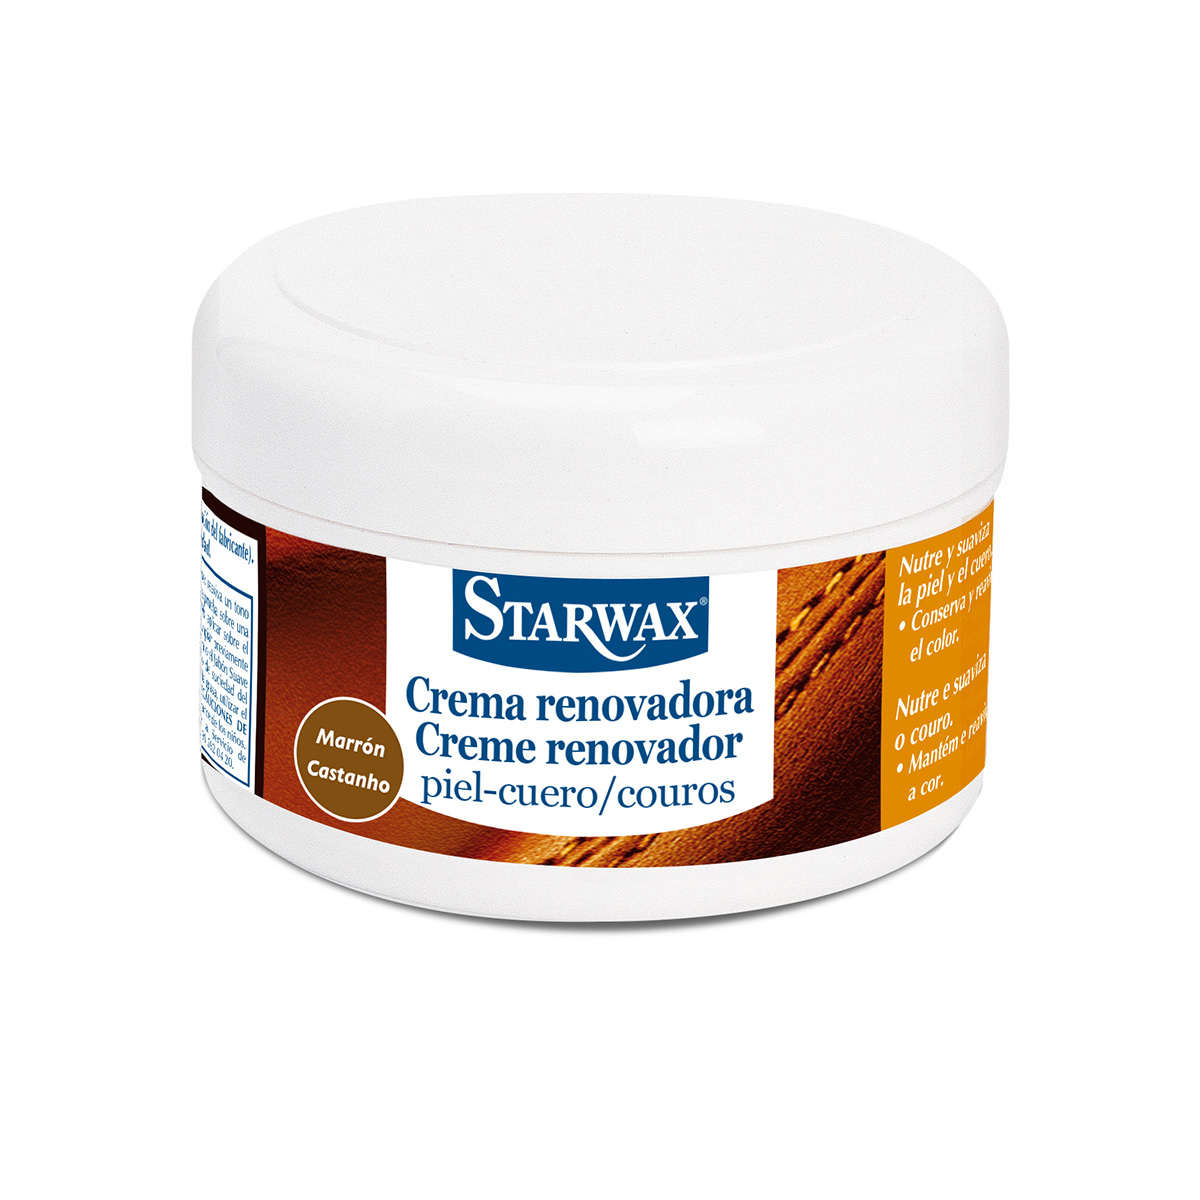 Crema renovadora colorante cuero - Starwax